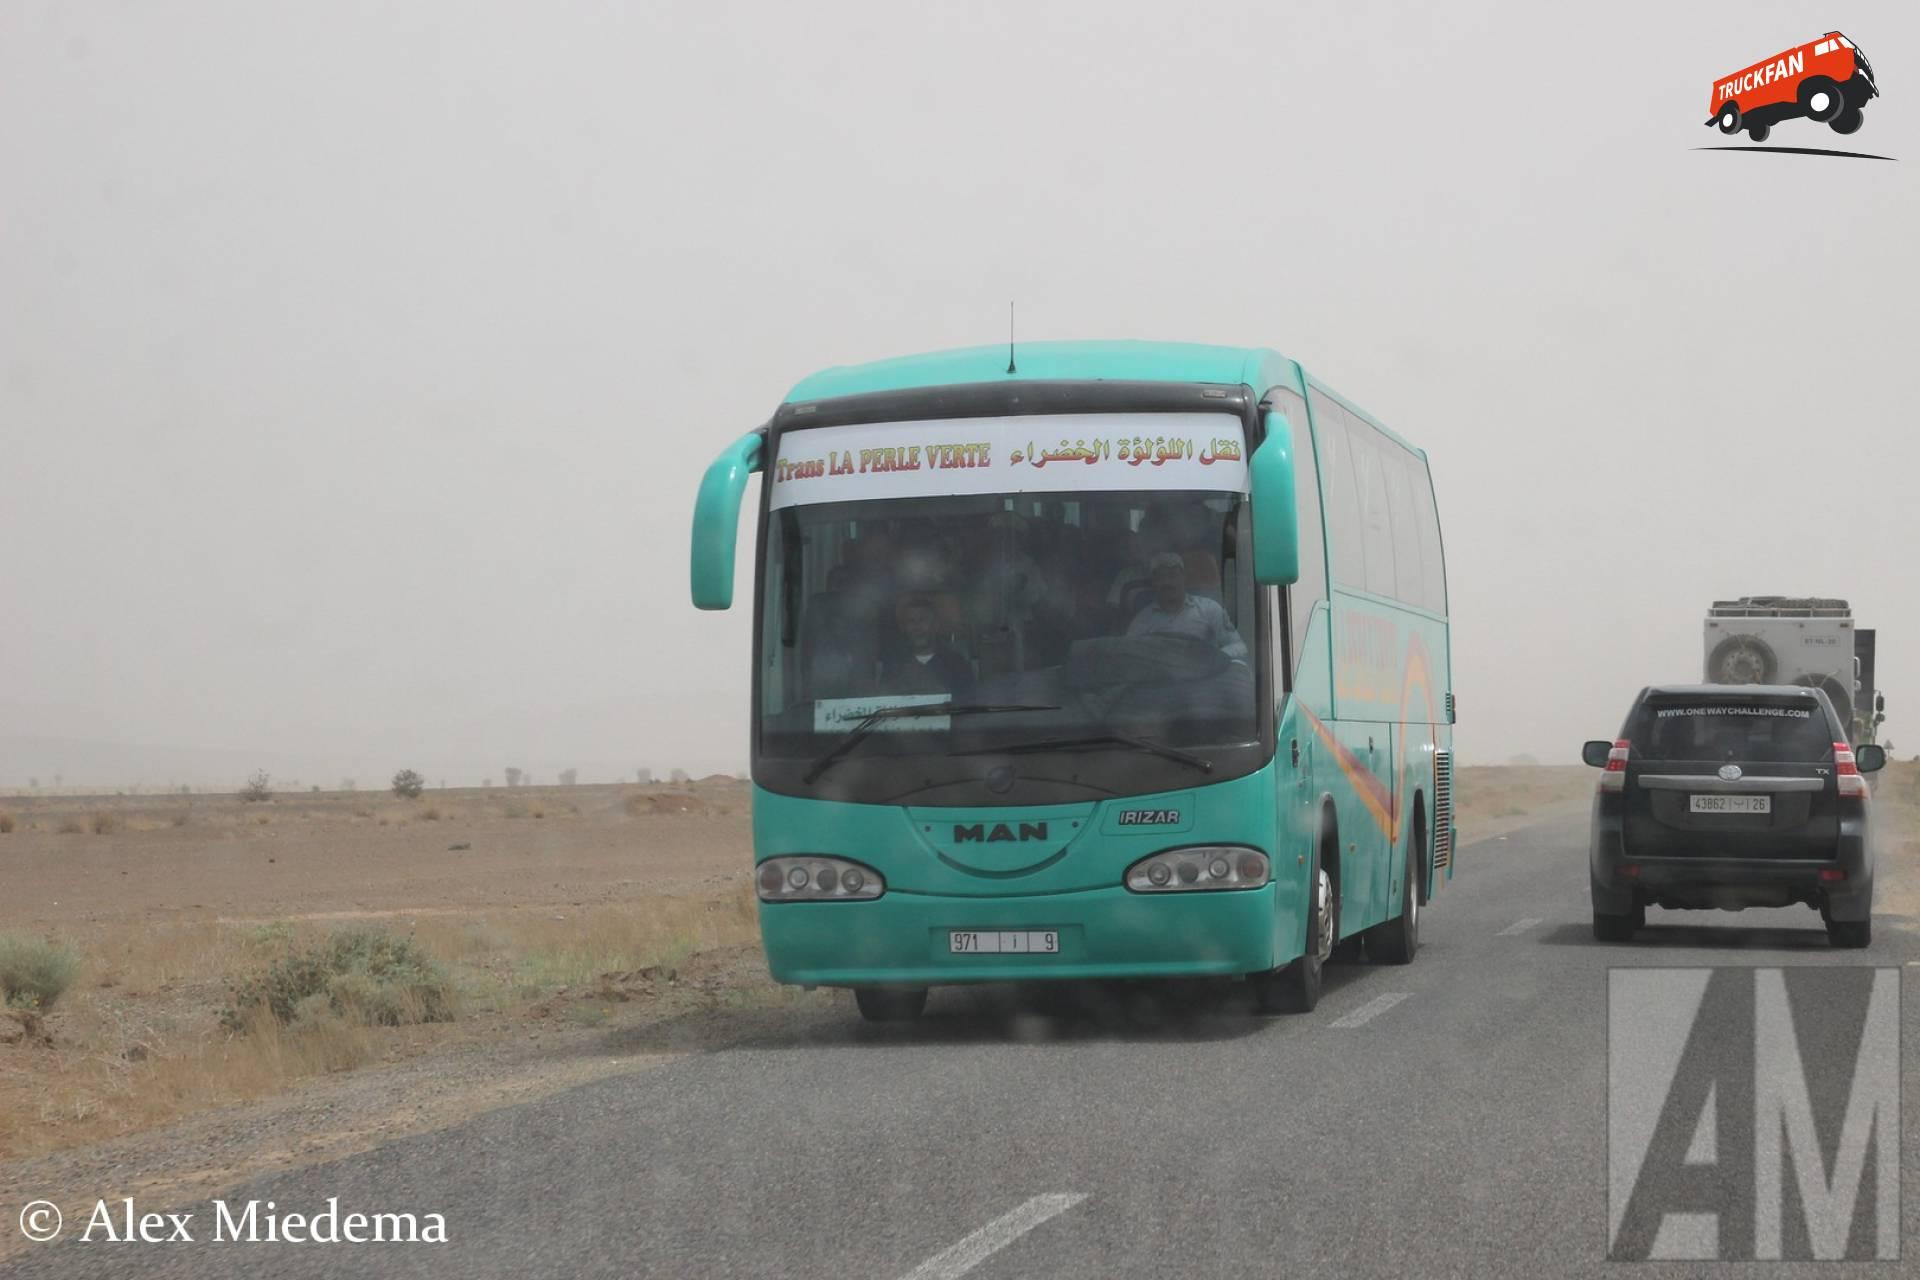 Irizar bus